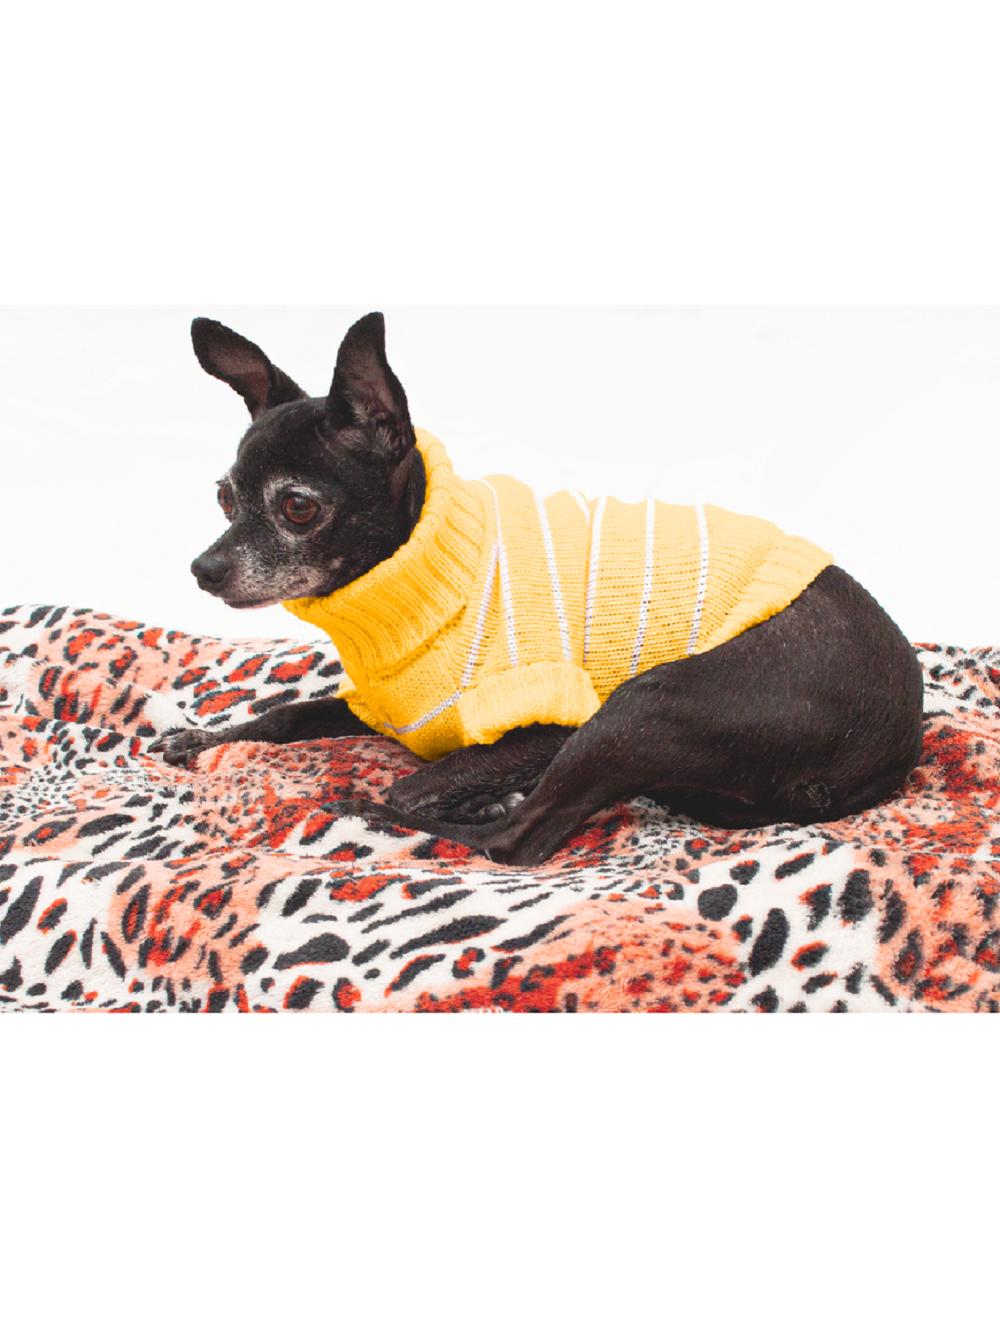 Saco Mandy para Perros Amarillo XS - Ciudaddemascotas.com